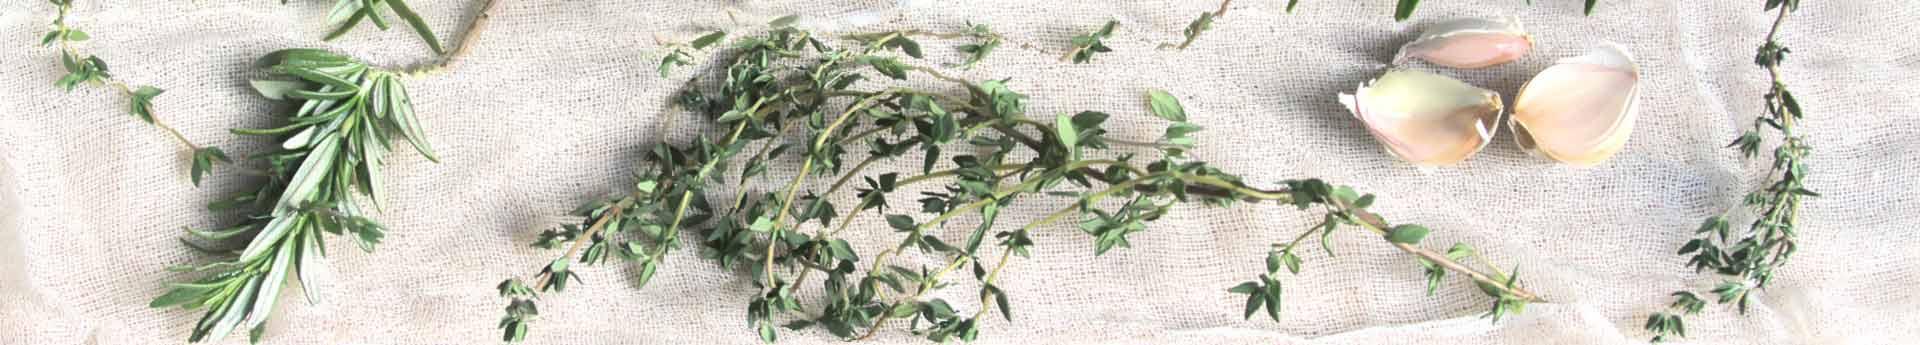 bg-3-herbs2